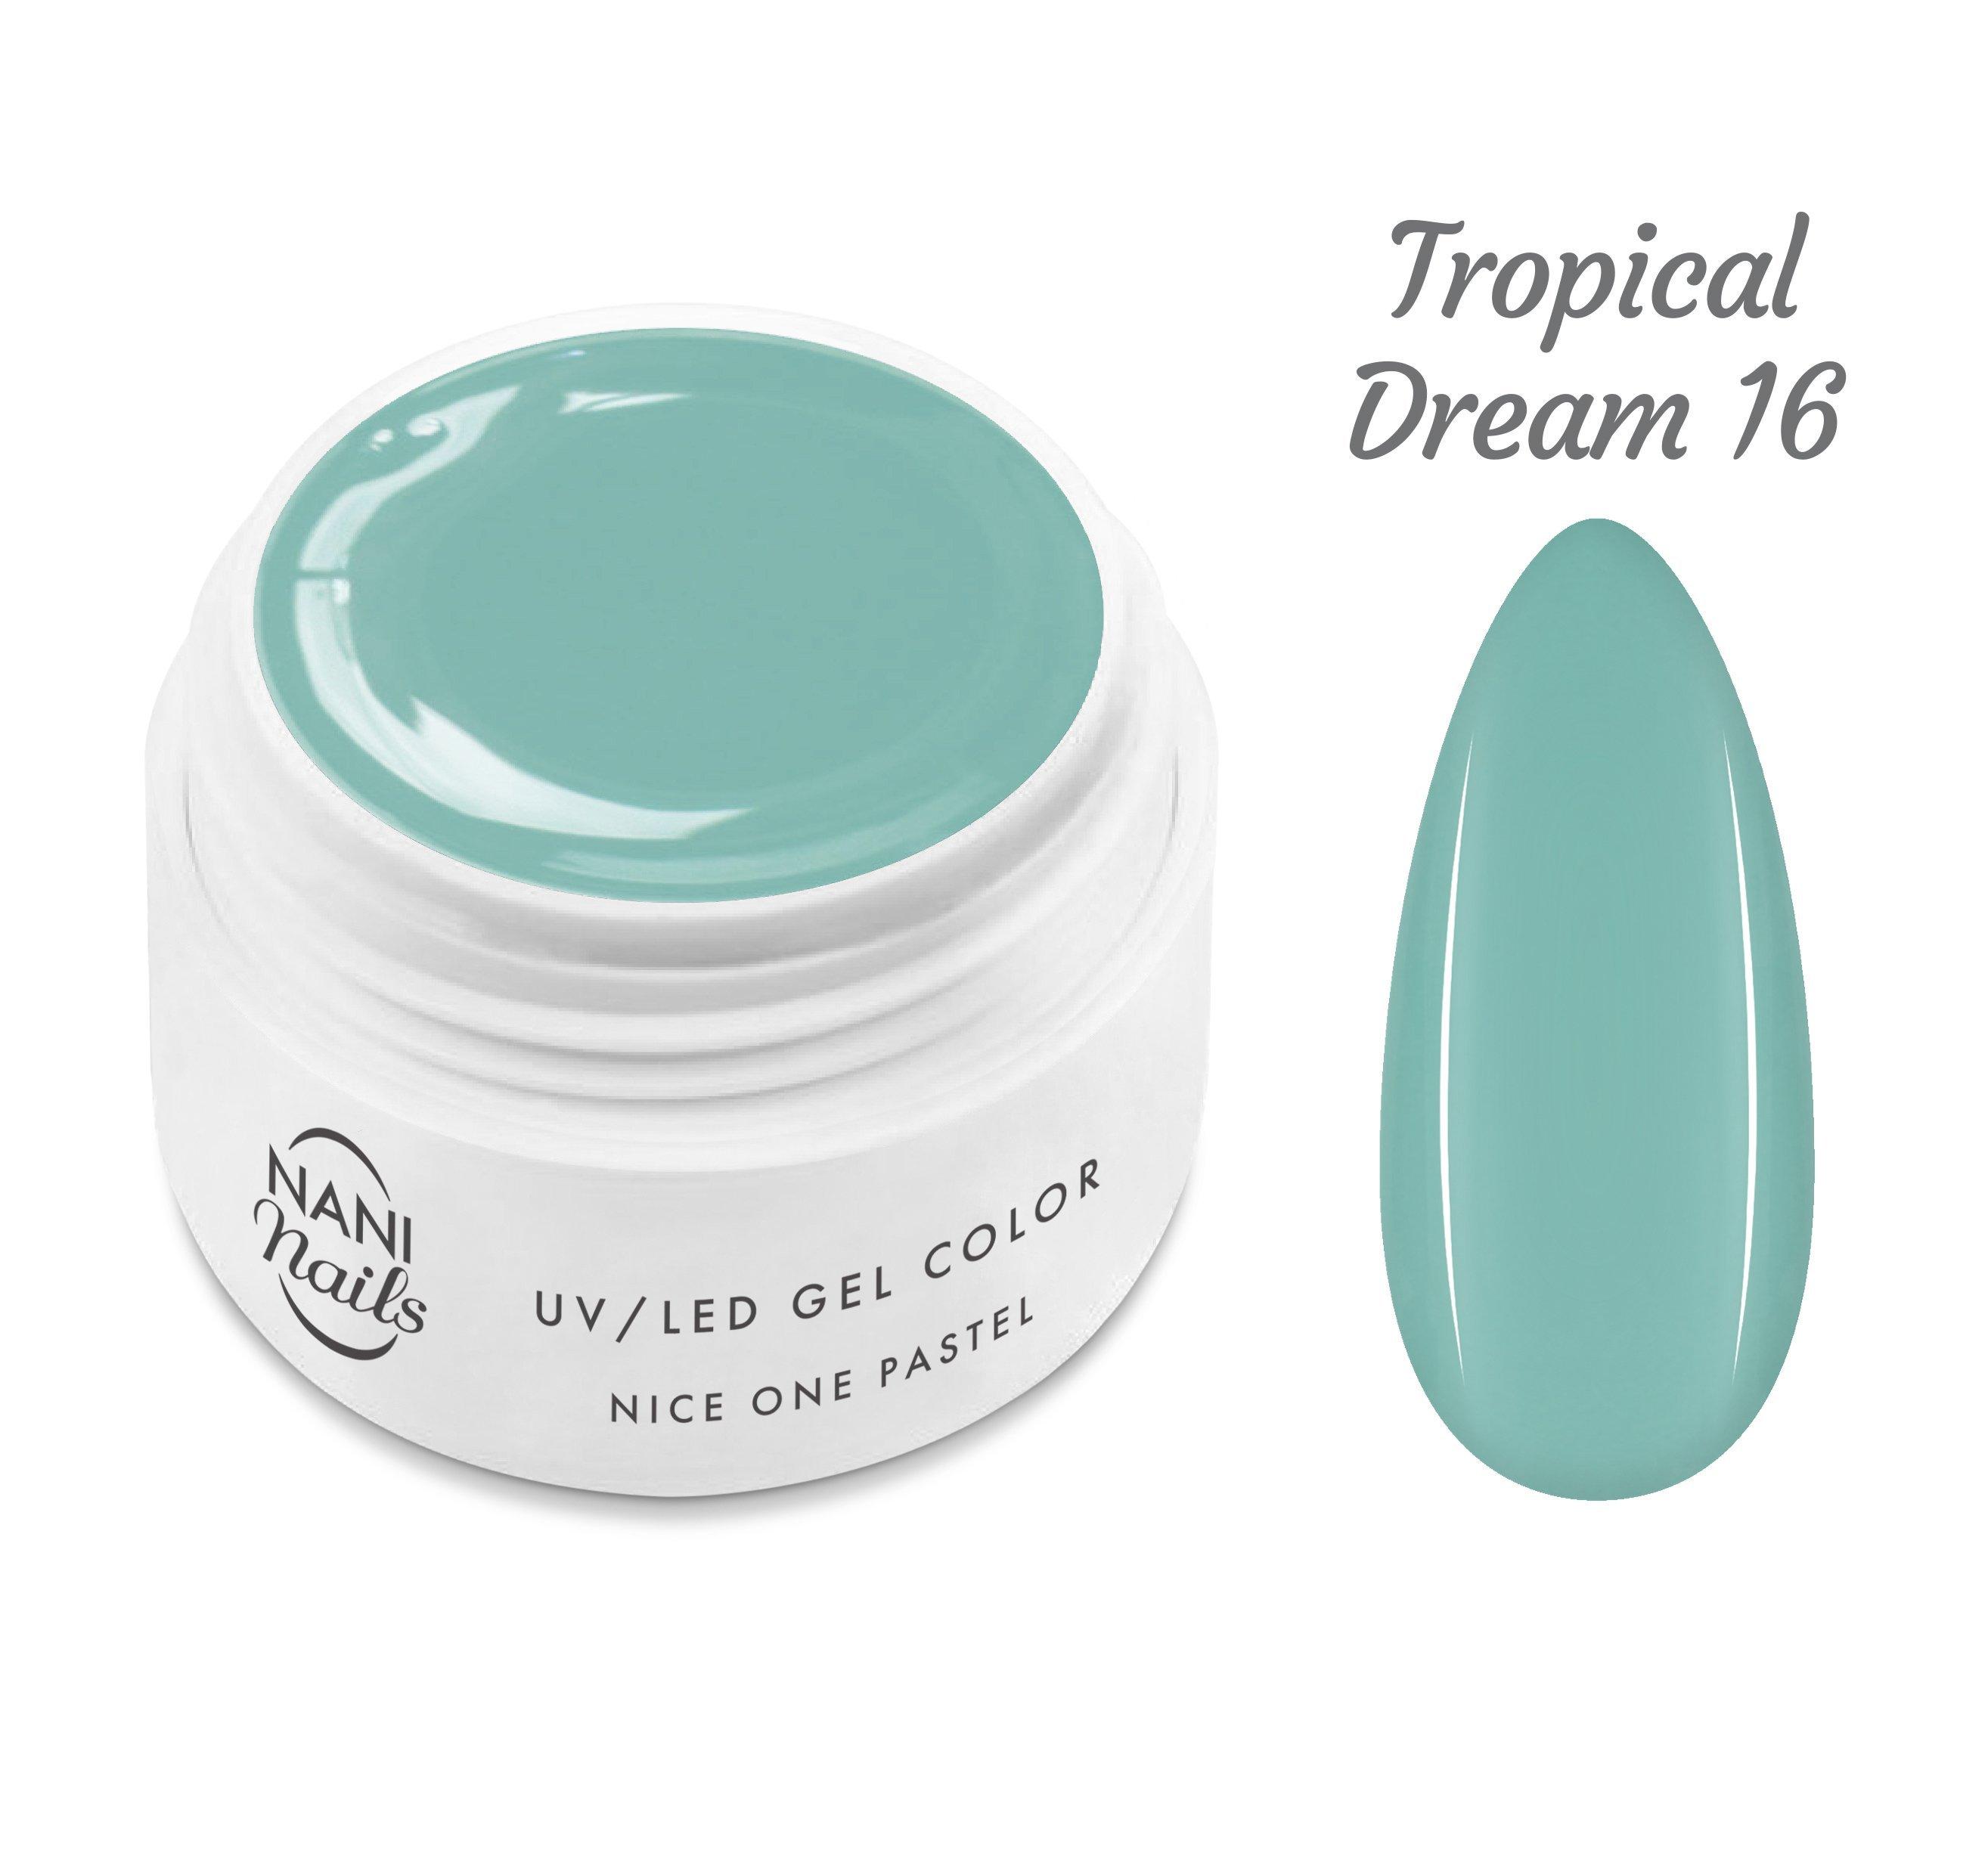 NANI UV gél Nice One Pastel 5 ml - Tropical Dream